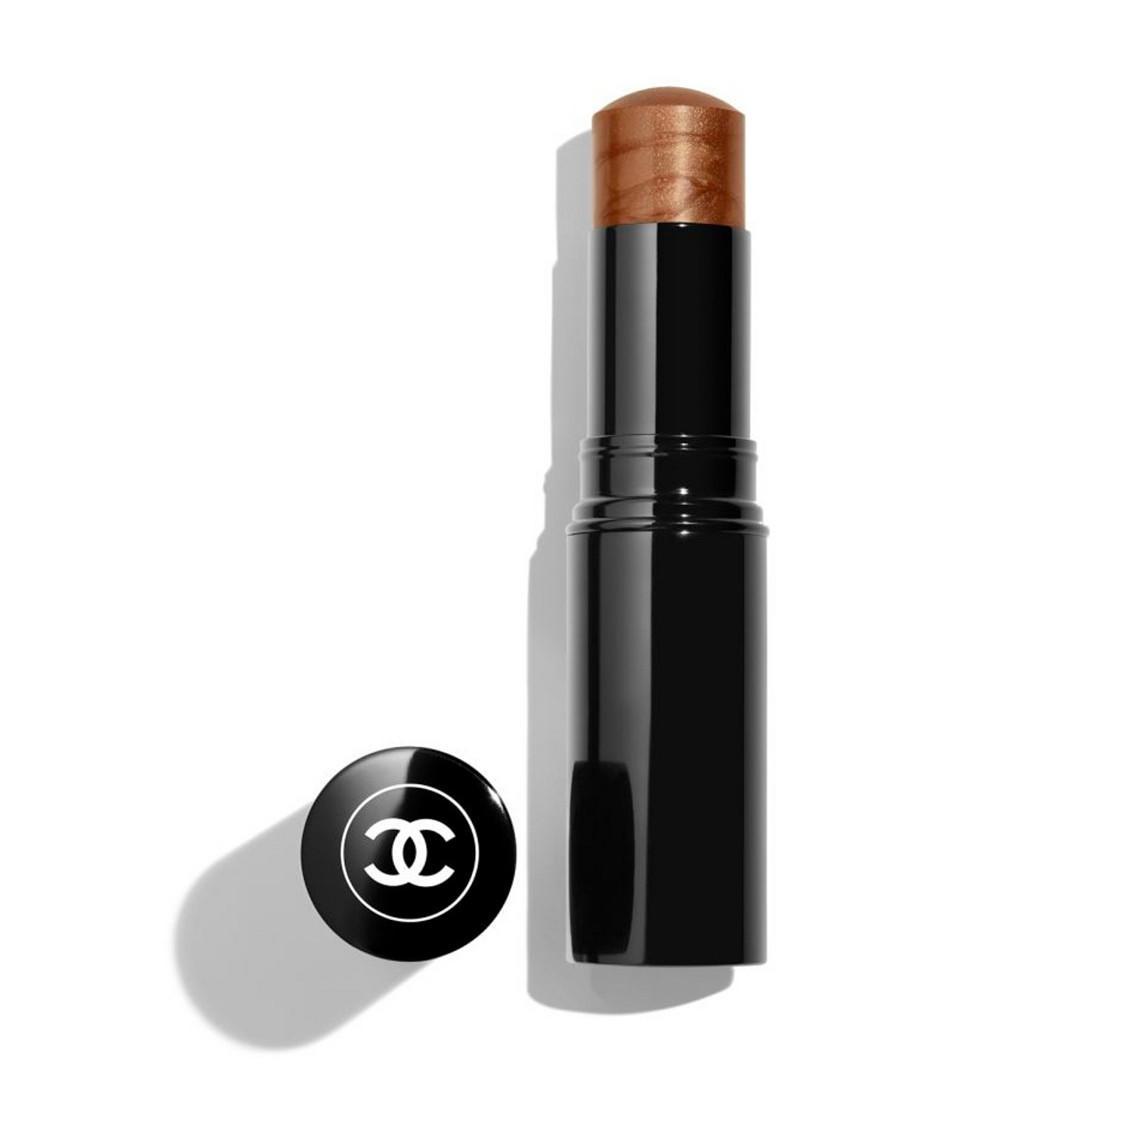 Chanel Baume Essentielle Multi-Use Glow Stick Golden Light